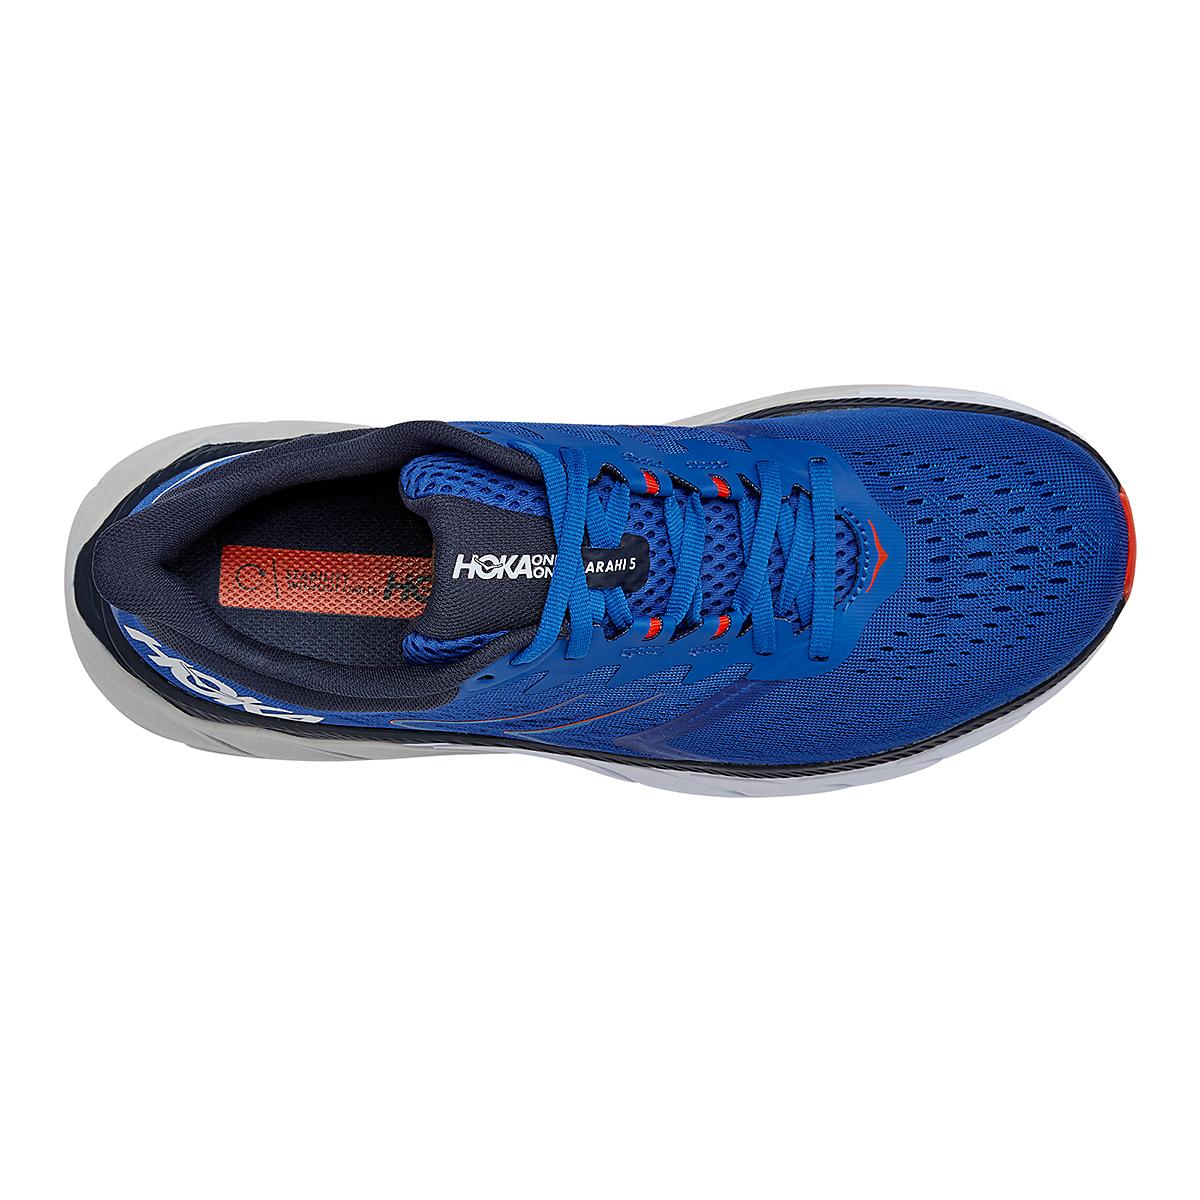 Men's Hoka One One Arahi 5 Running Shoe - Color: Turkish Sea/White - Size: 7 - Width: Regular, Turkish Sea/White, large, image 5